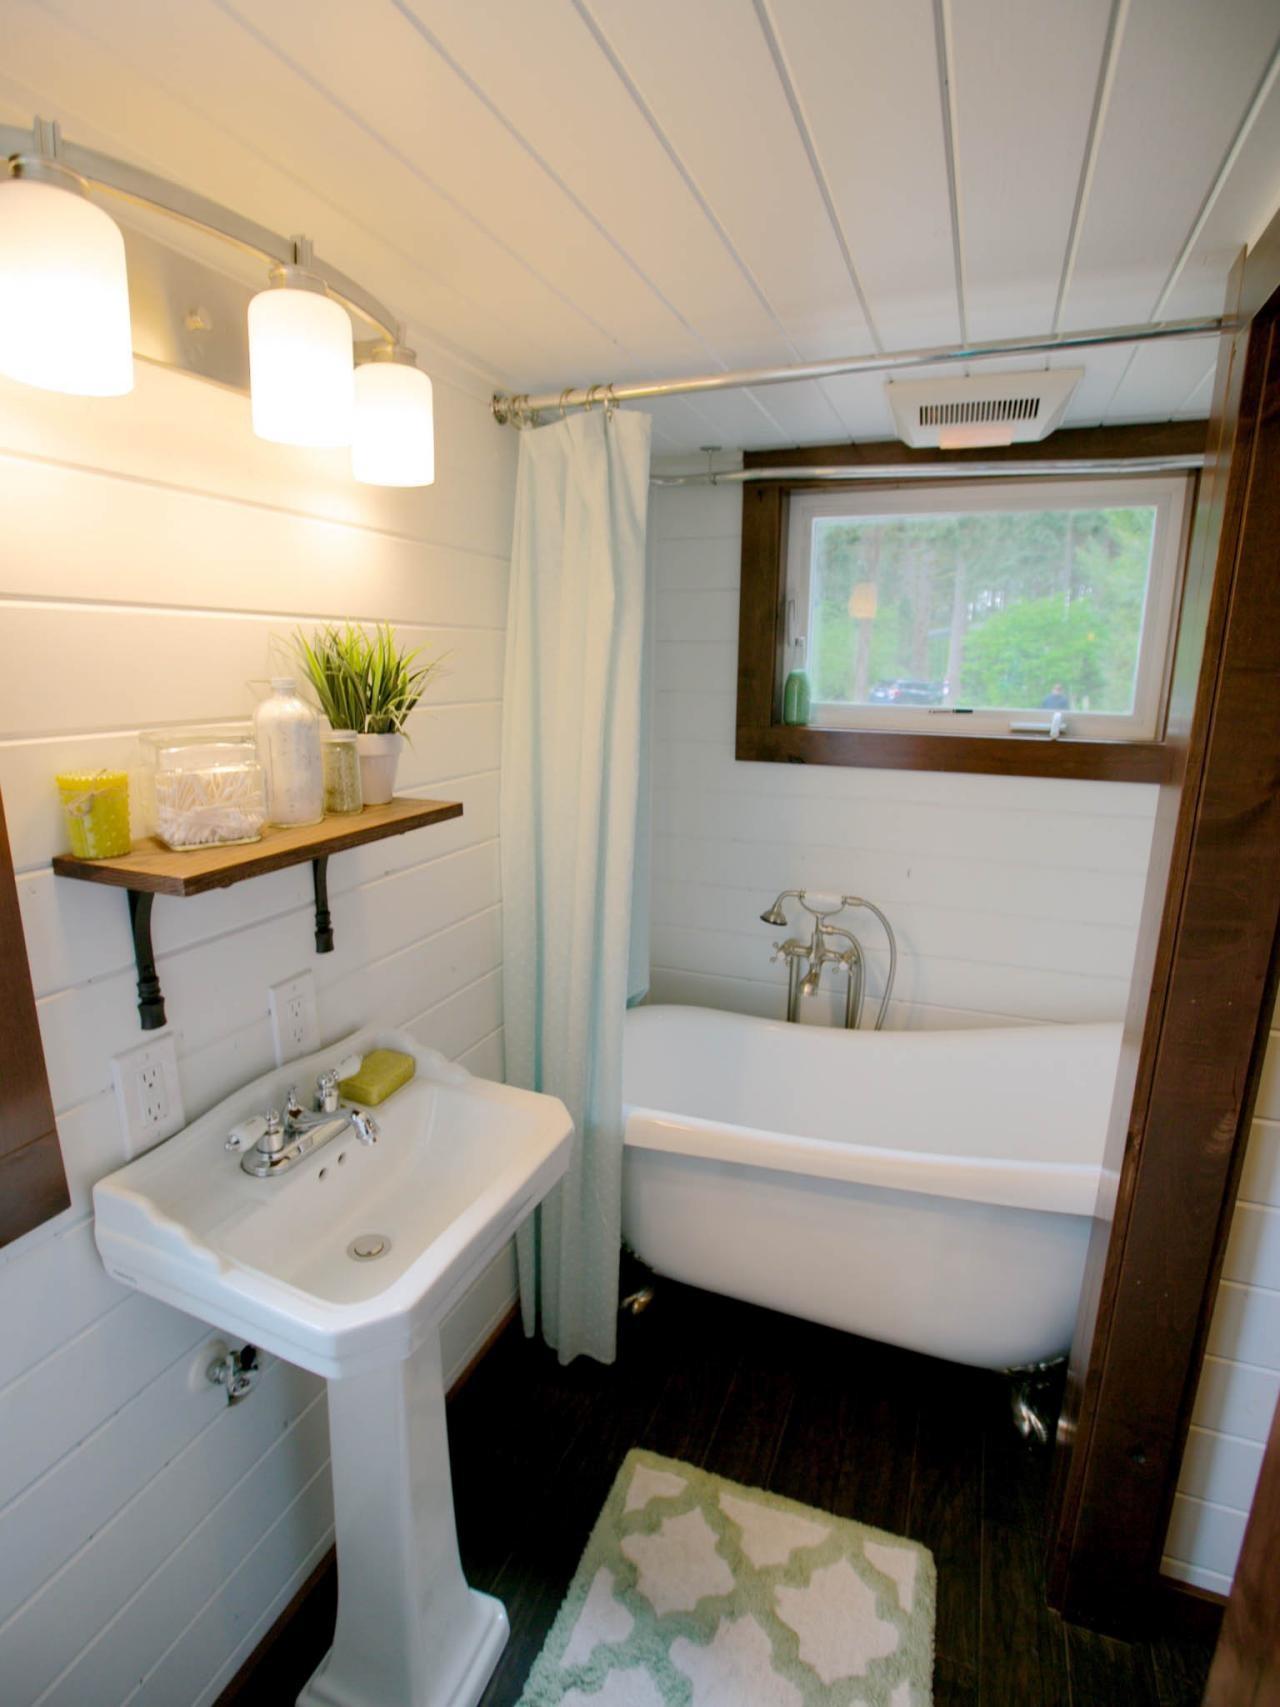 Amazing Tiny House Bathroom Ideas - Home Sweet Home ...